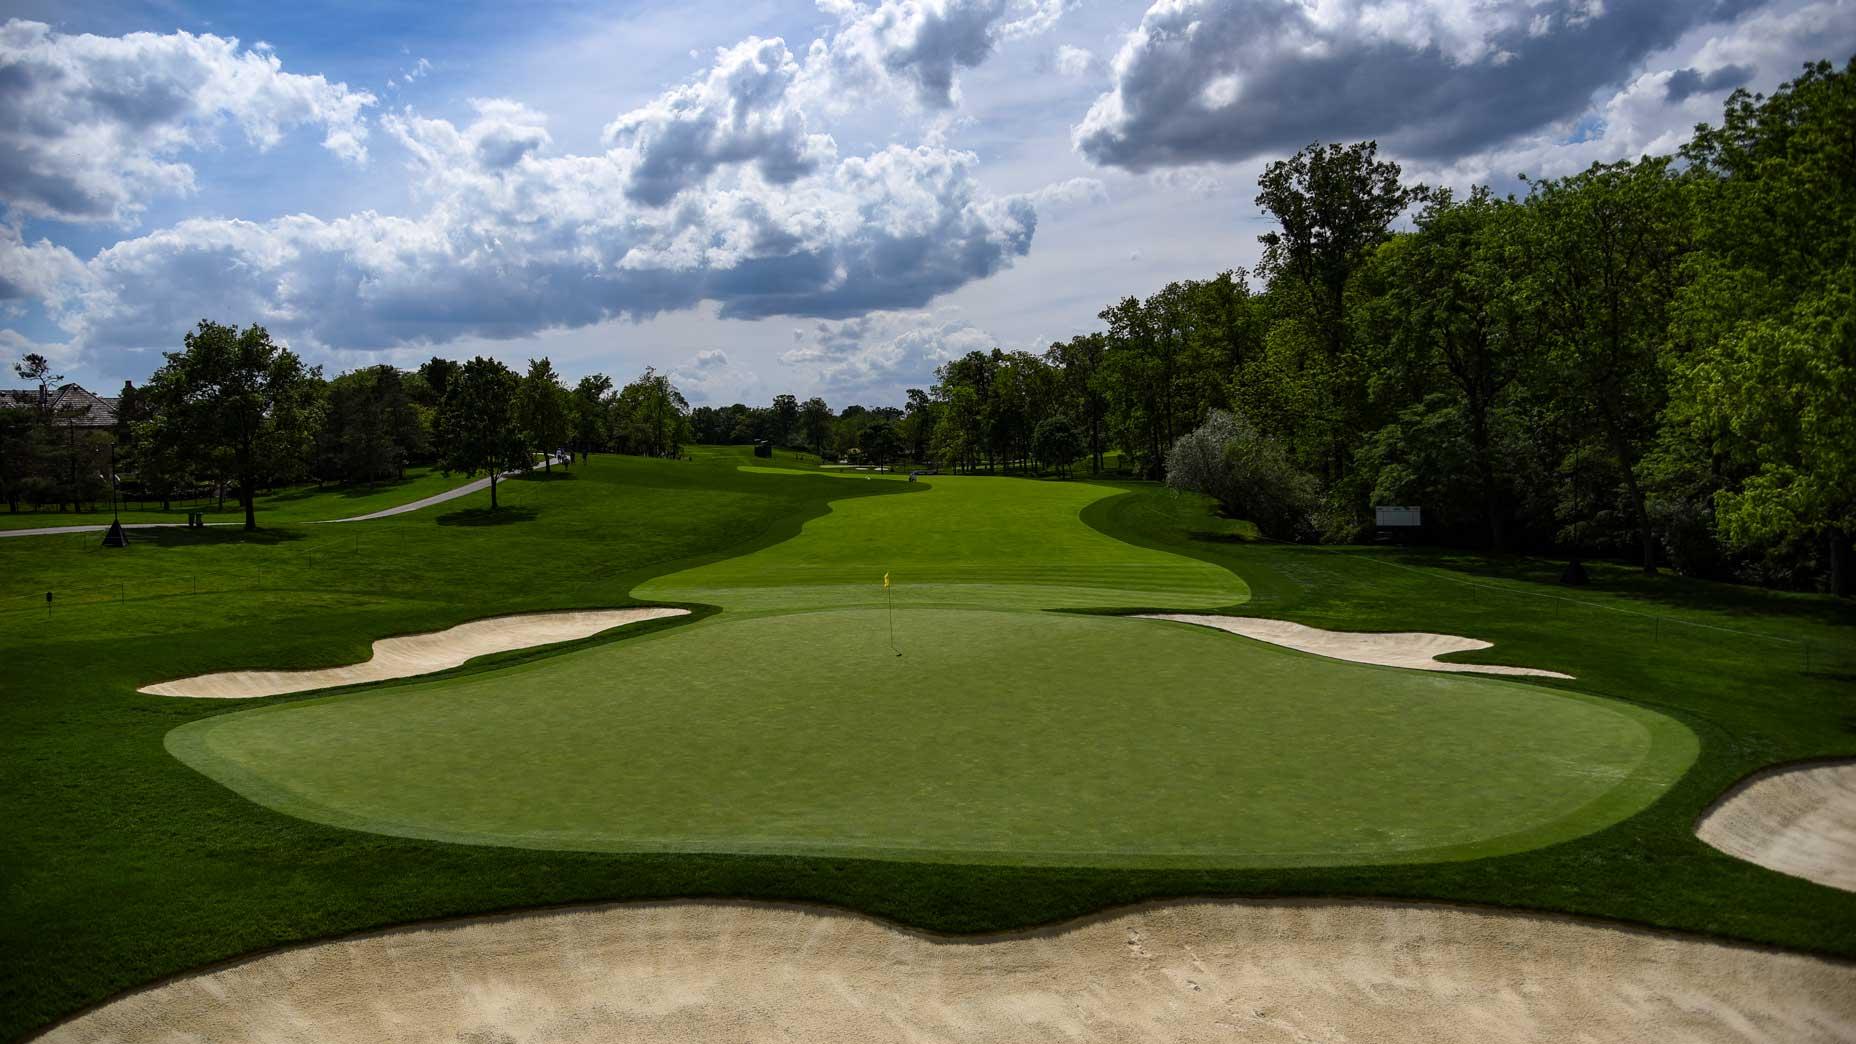 The par-4 1st hole at Muirfield Village Golf Club in 2017.